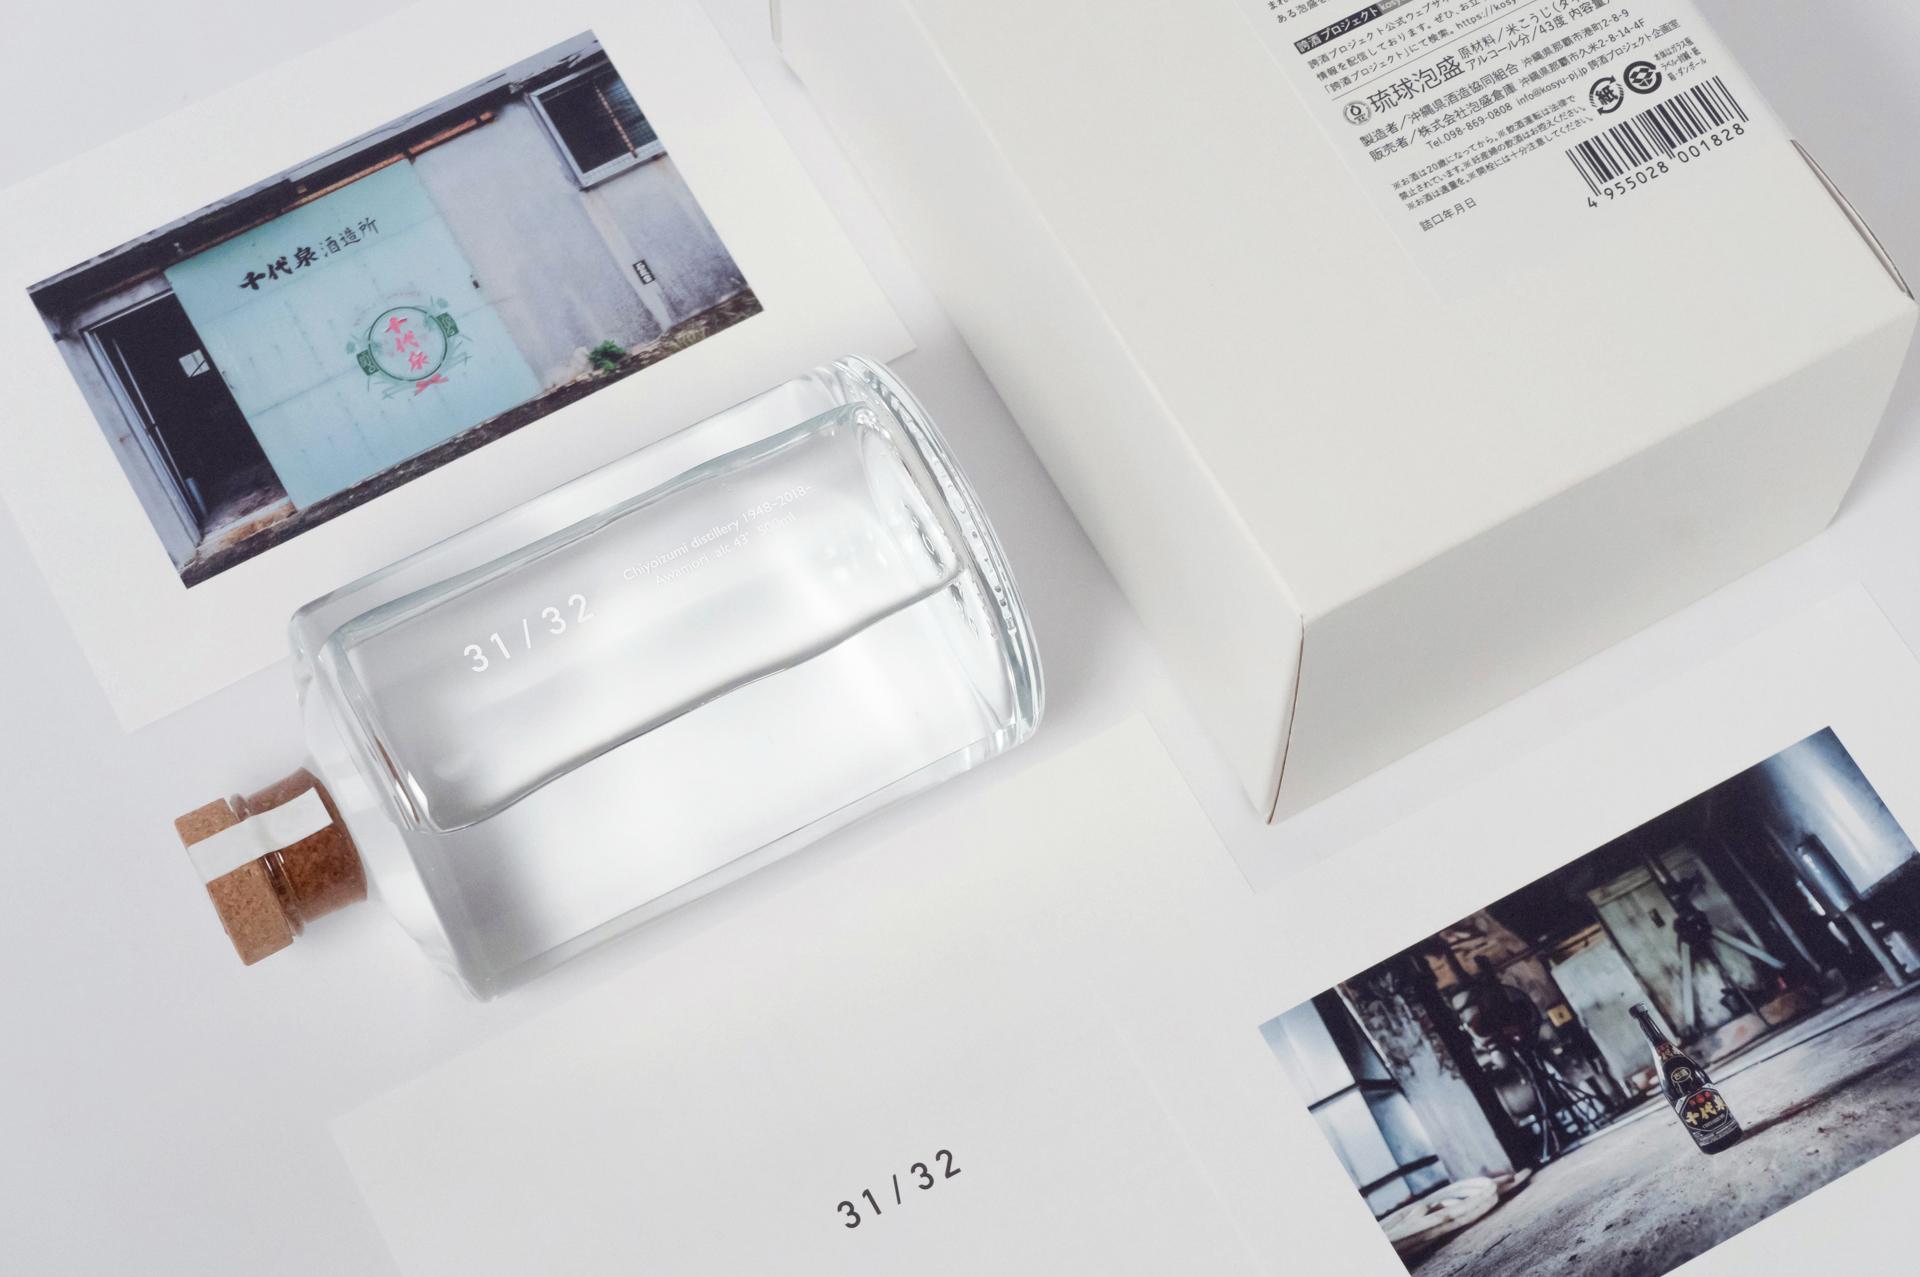 Fukuda Design and BARBE -31:32 Chiyoizumi3.jpg